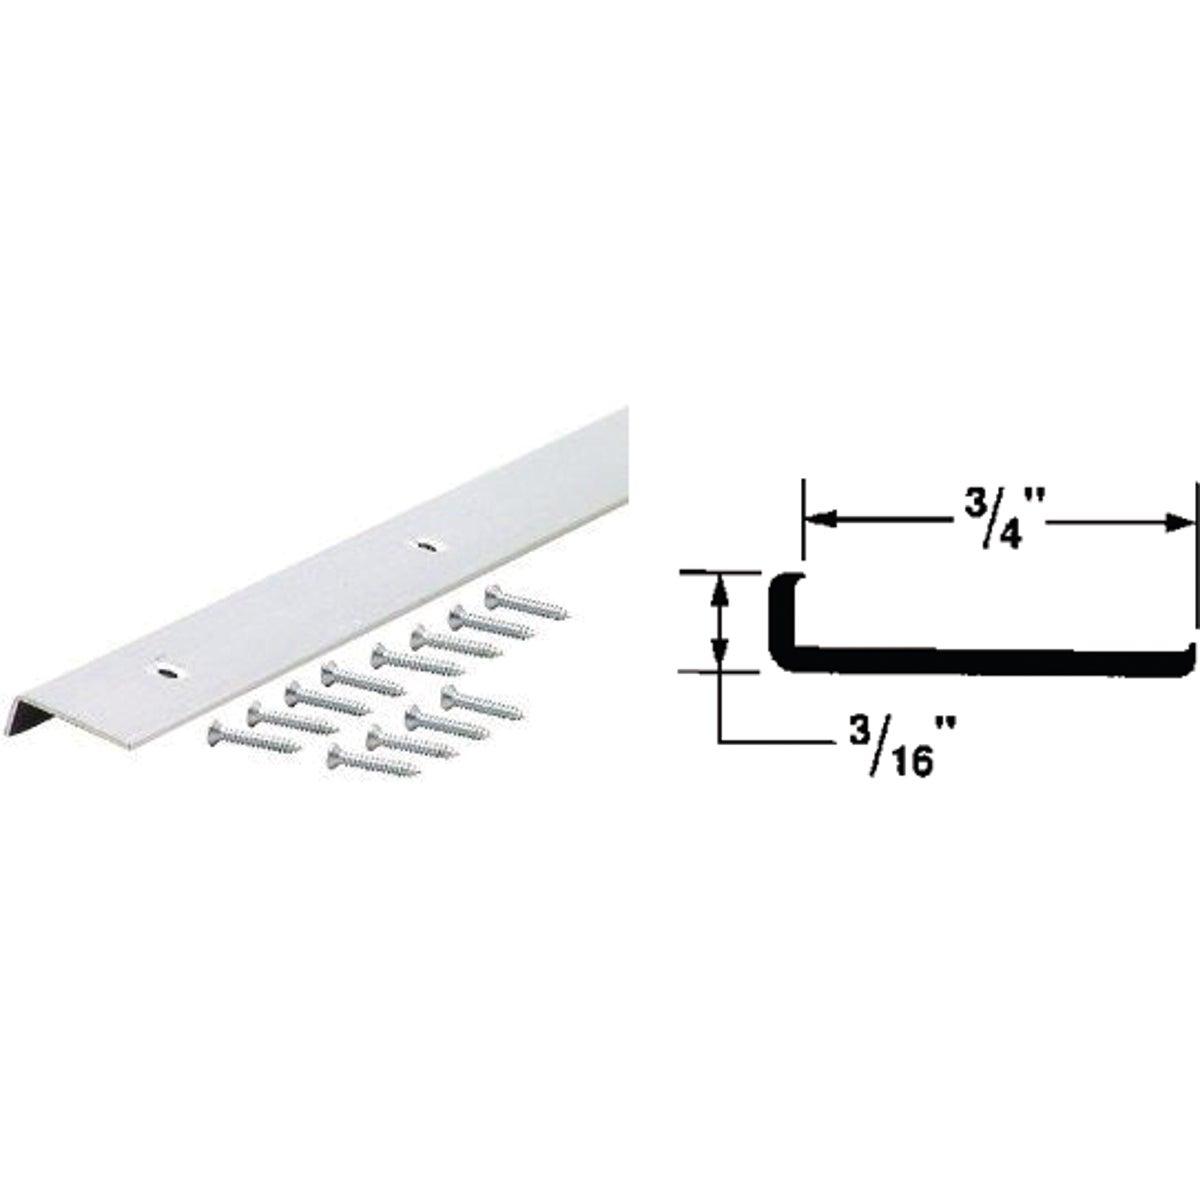 M-D Building Products 3/4